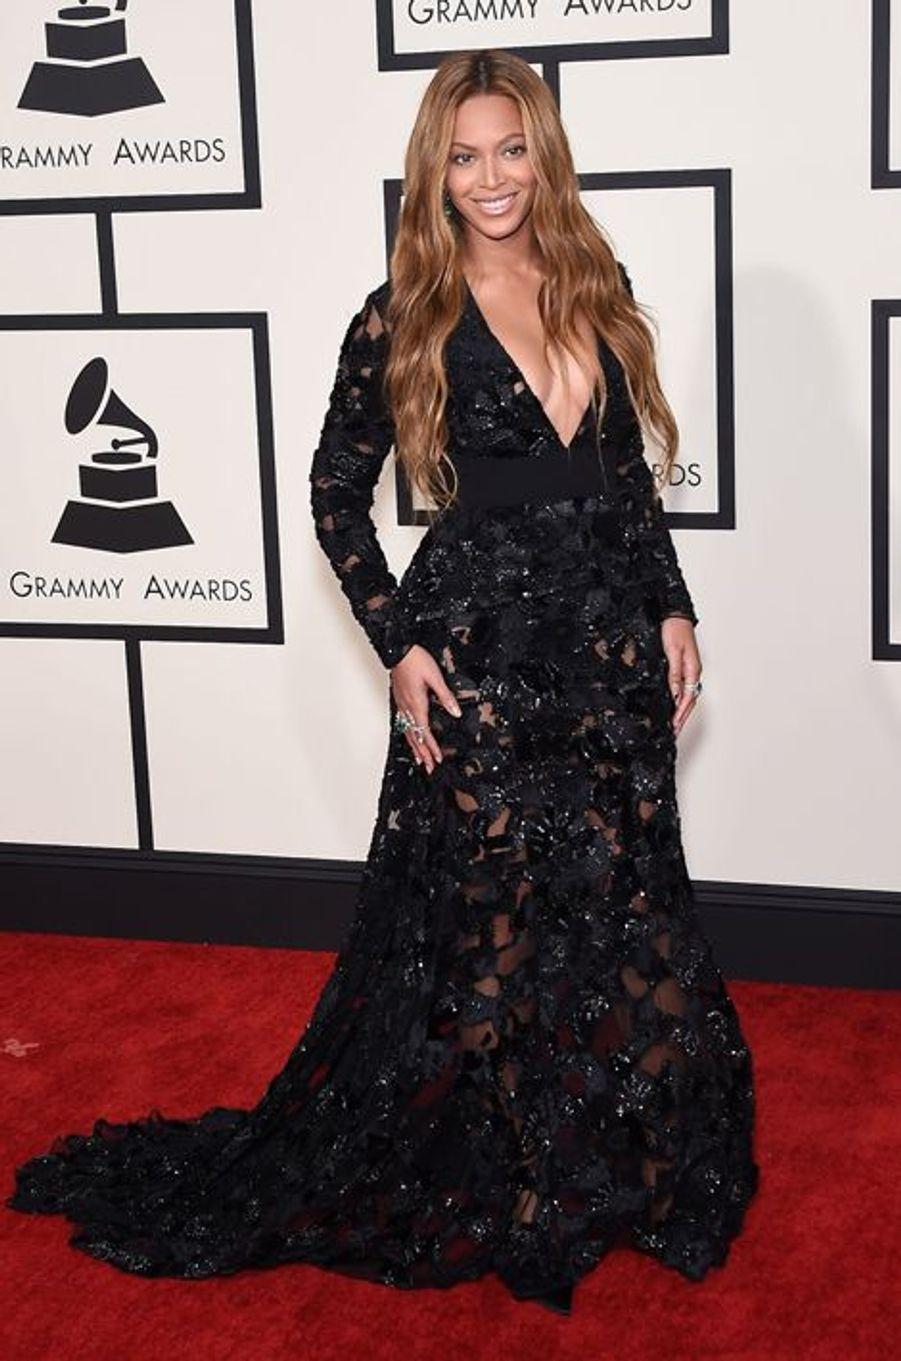 En février 2015 aux Grammy Awards